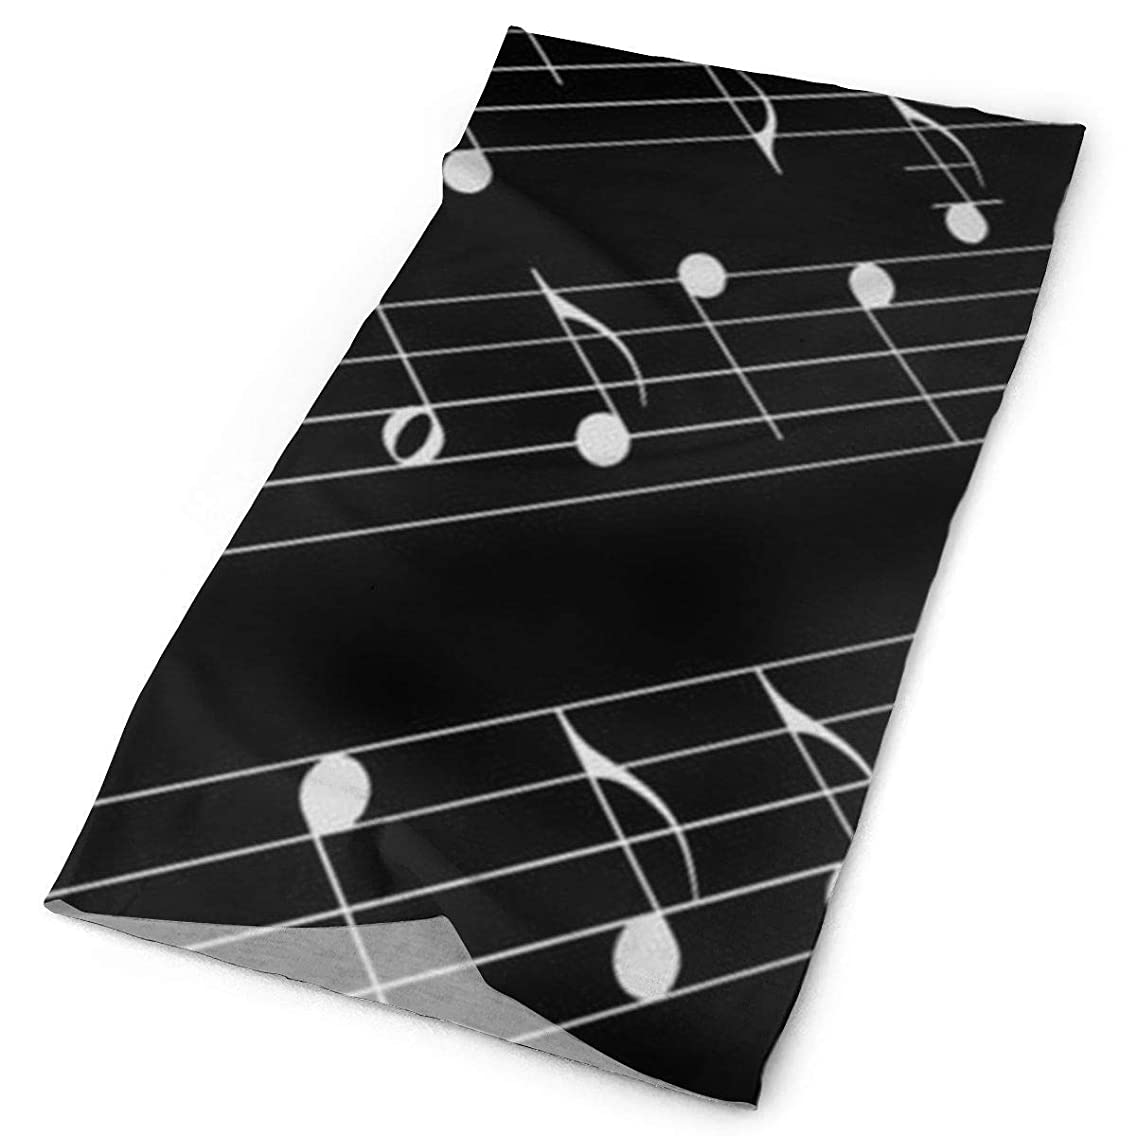 Clothing Accessories 12-in-1 Headwear - UPF 30 Versatile Outdoors Daily Headwear - Black and White Piano Keys Headband Neck Gaiter Bandana Balaclava Performance Moisture Wicking